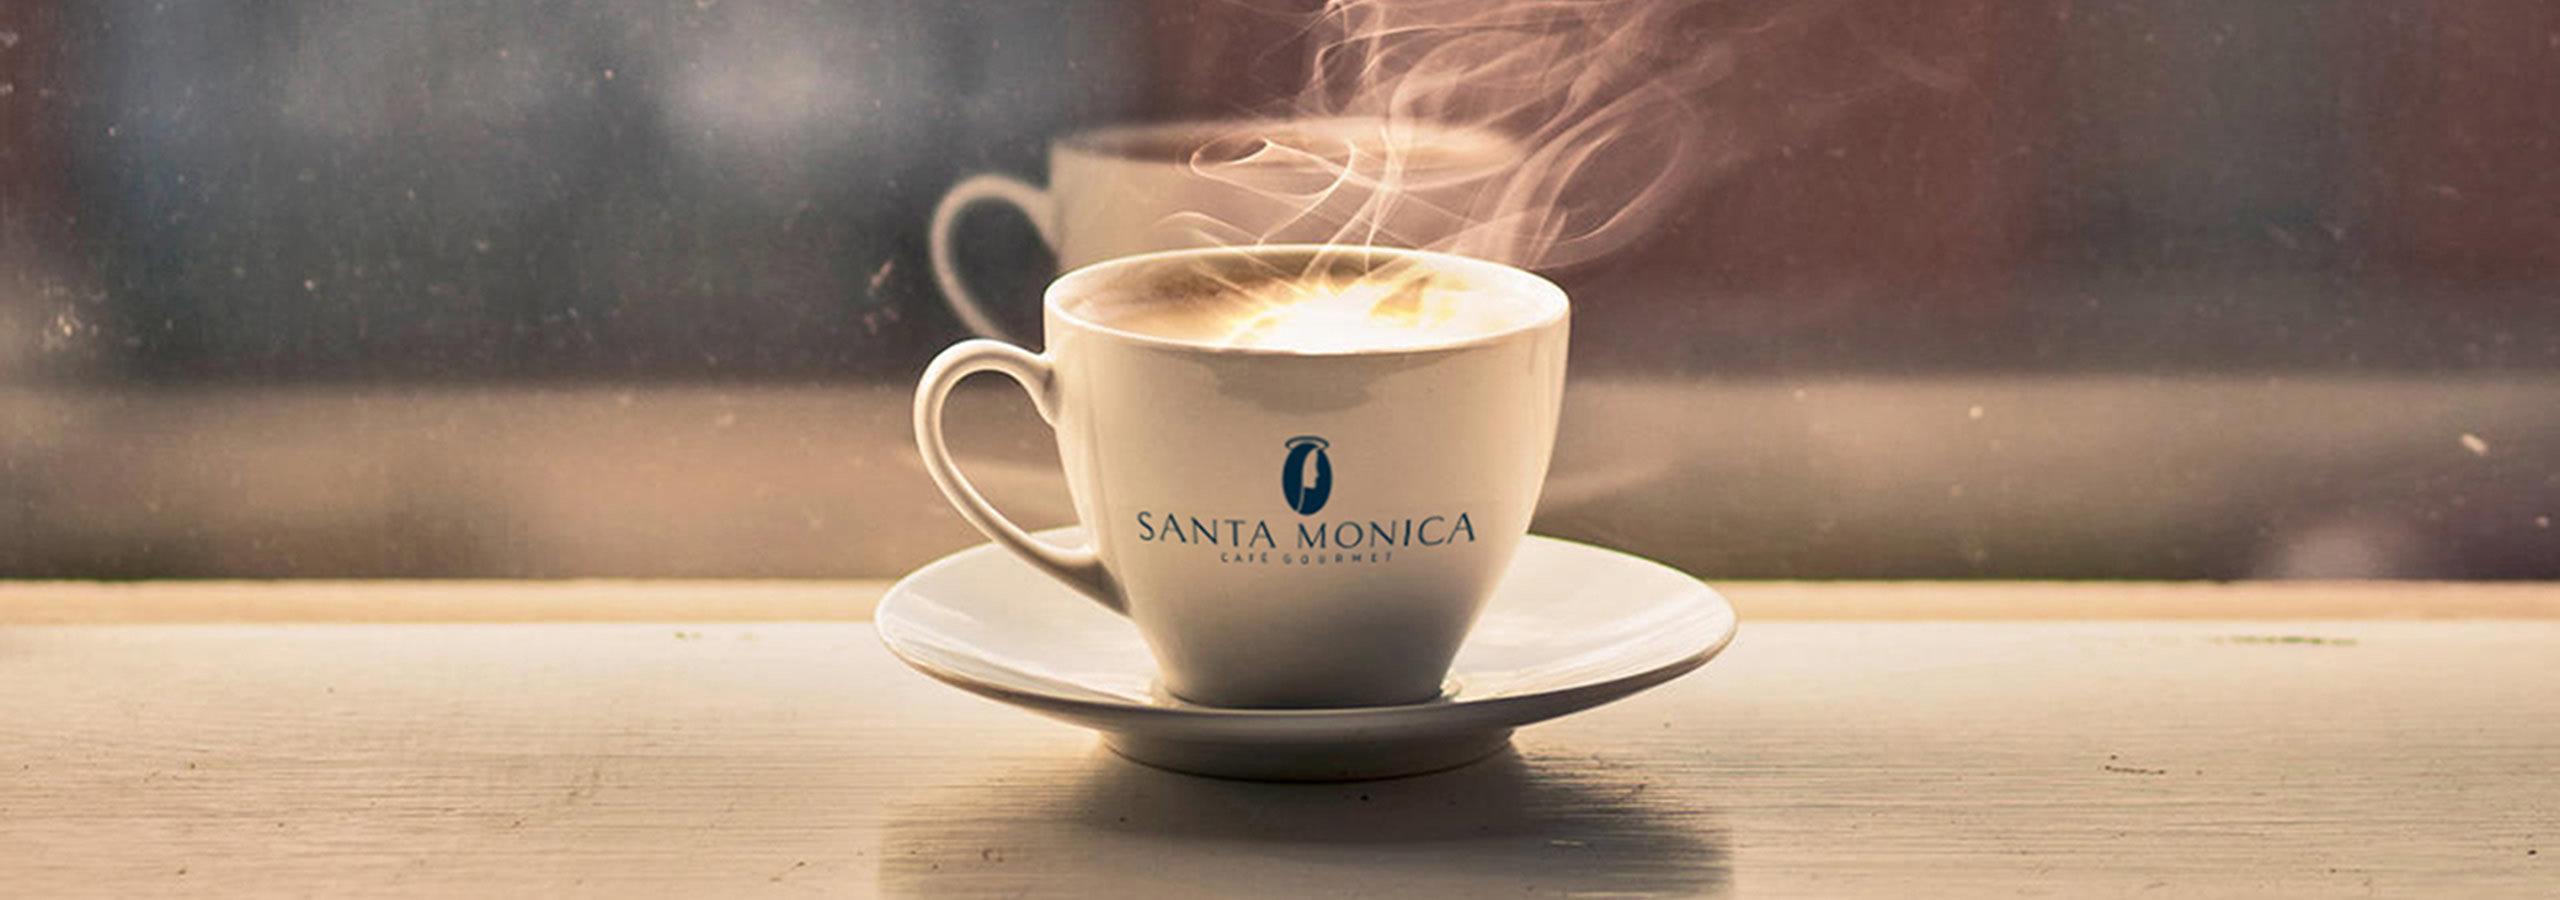 Specialty Coffee - Spezialitätenkaffee bei Kaffee Gourmet